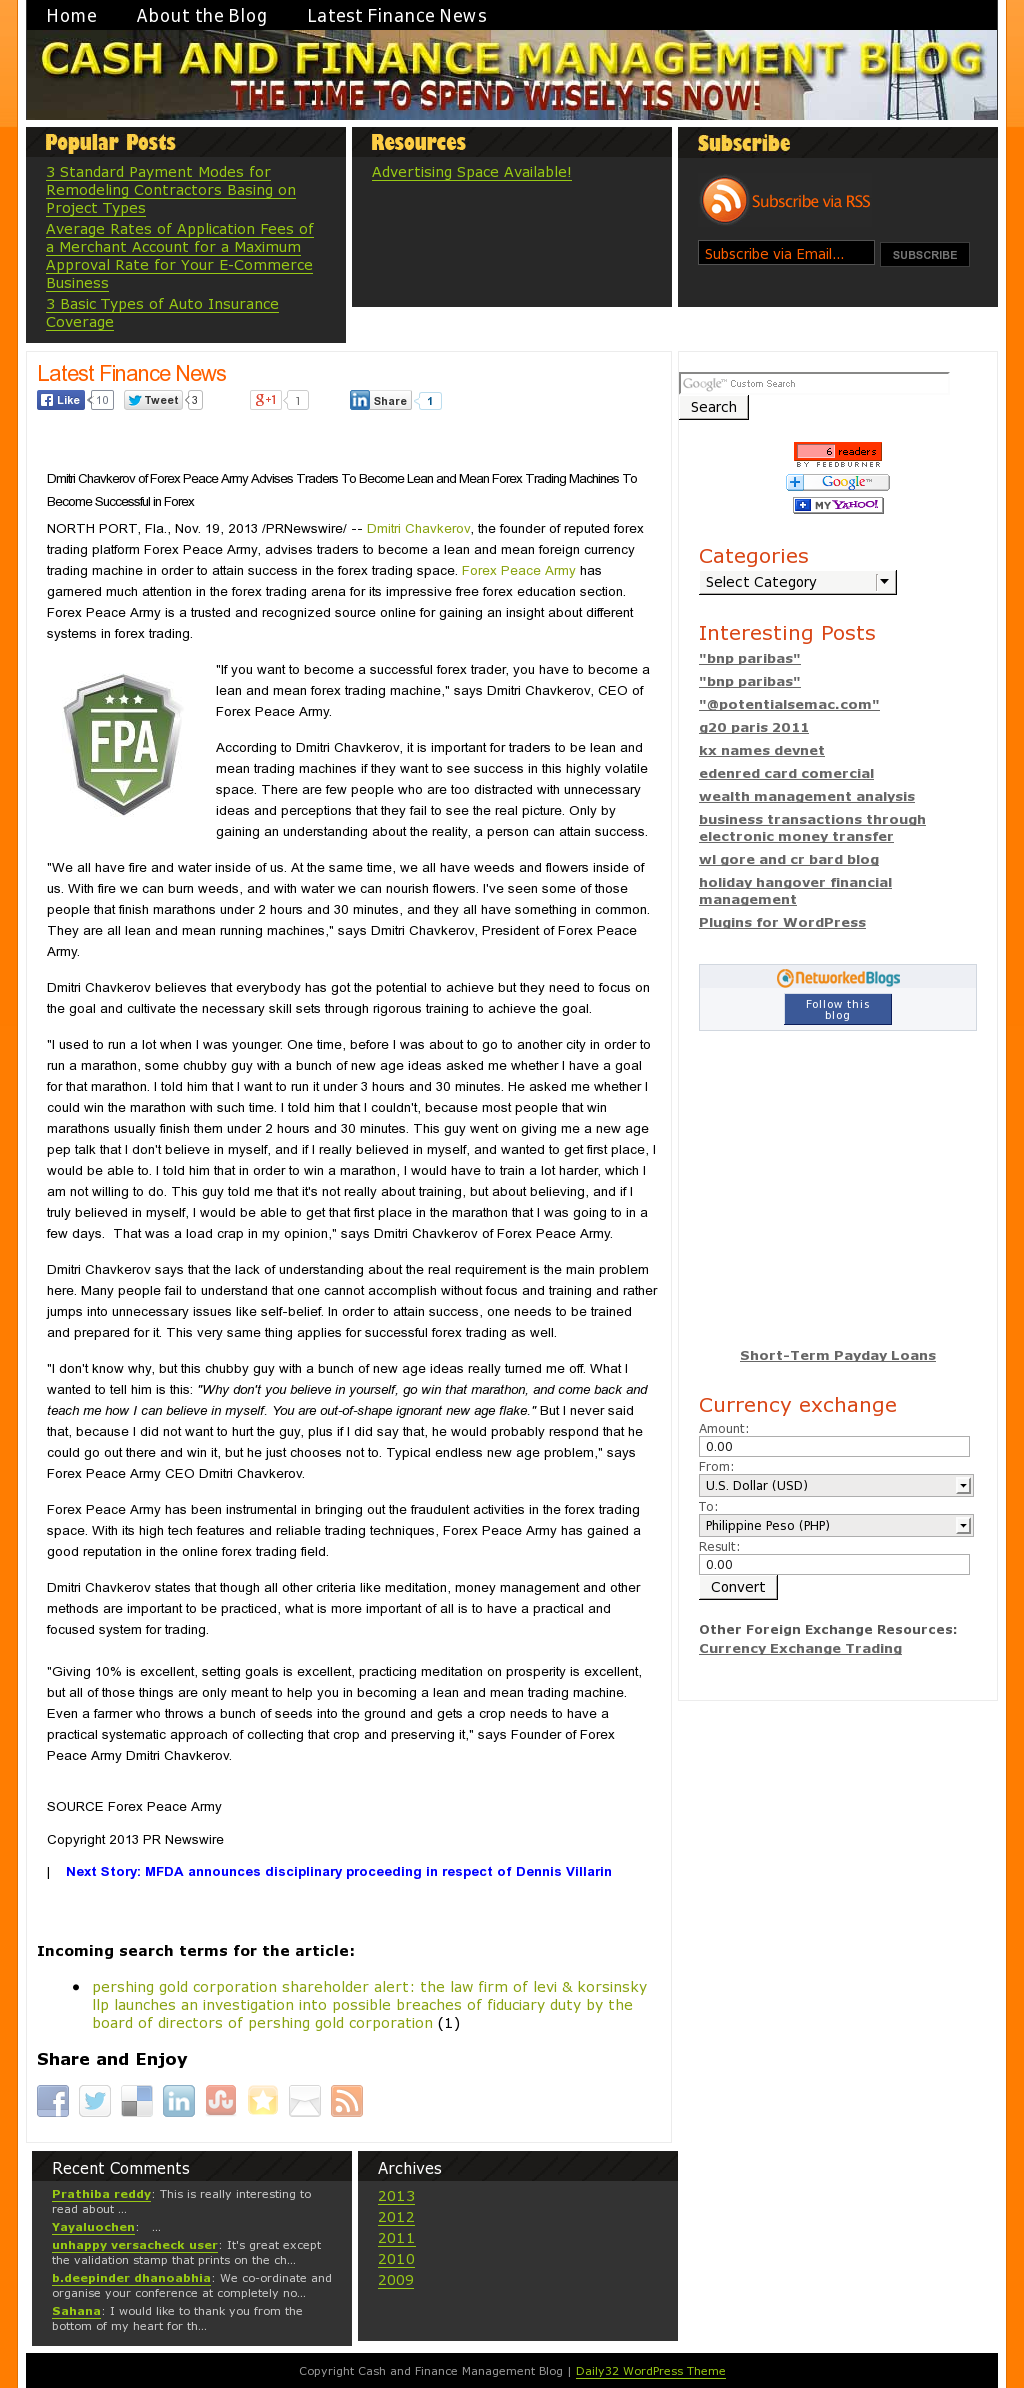 Dmitri Chavkerov - Cash and Finance Management Blog - Lean Forex Trading